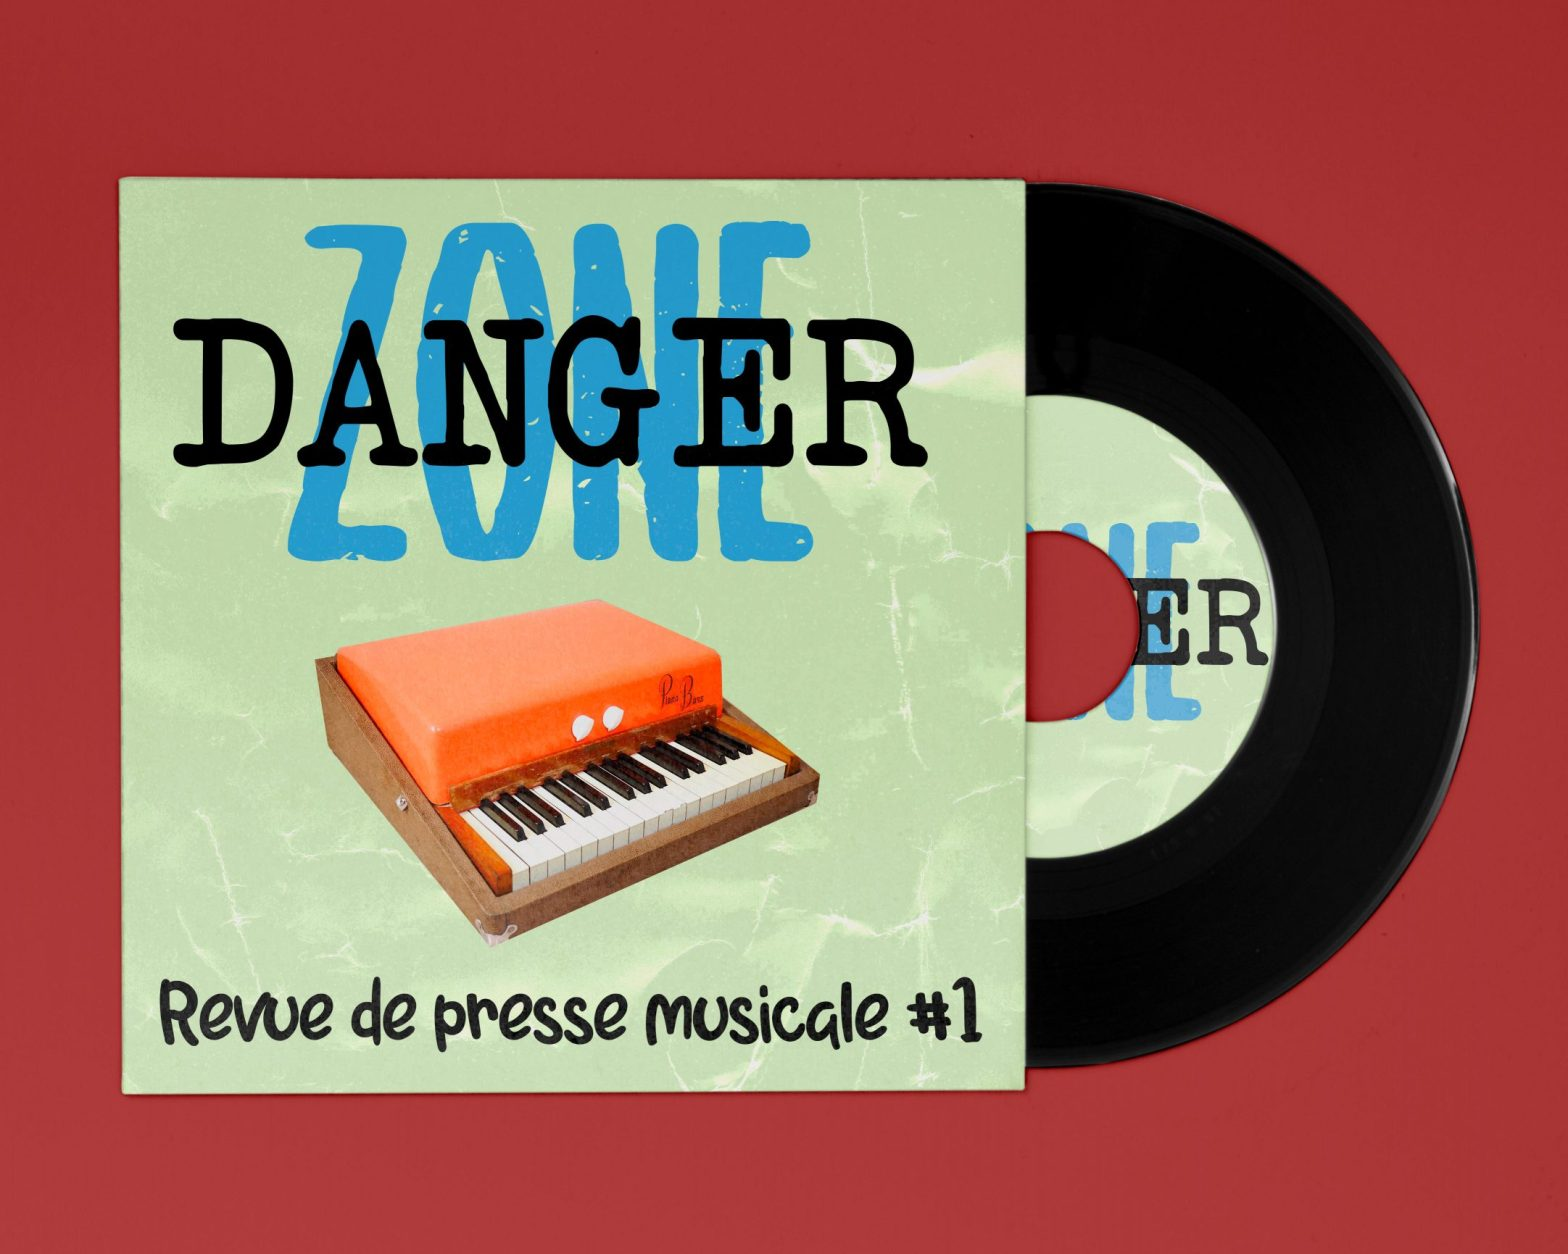 Revue de presse musicale 1 2021